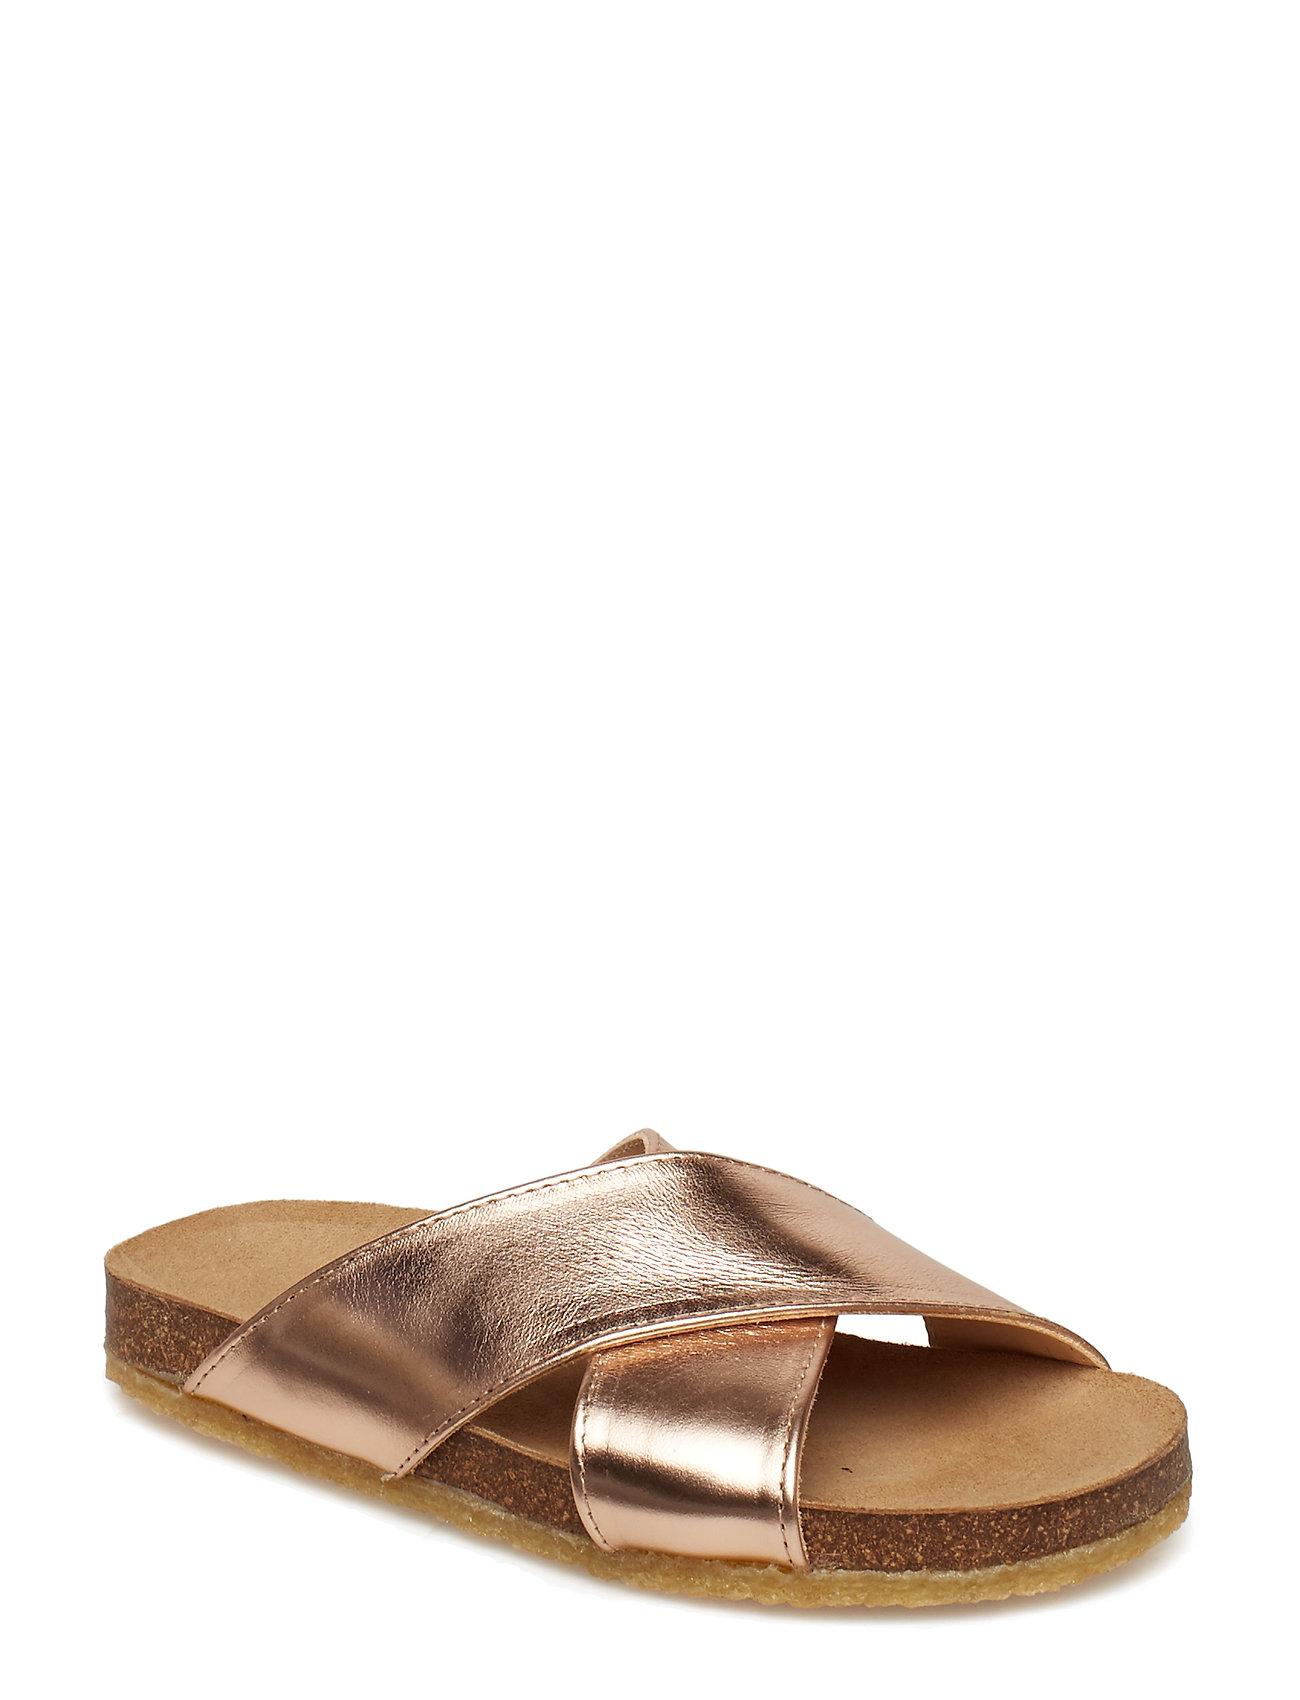 8d5b0ca57cbb 1933 BLACK ANGULUS Sandals - Flat sandaler for børn - Pashion.dk